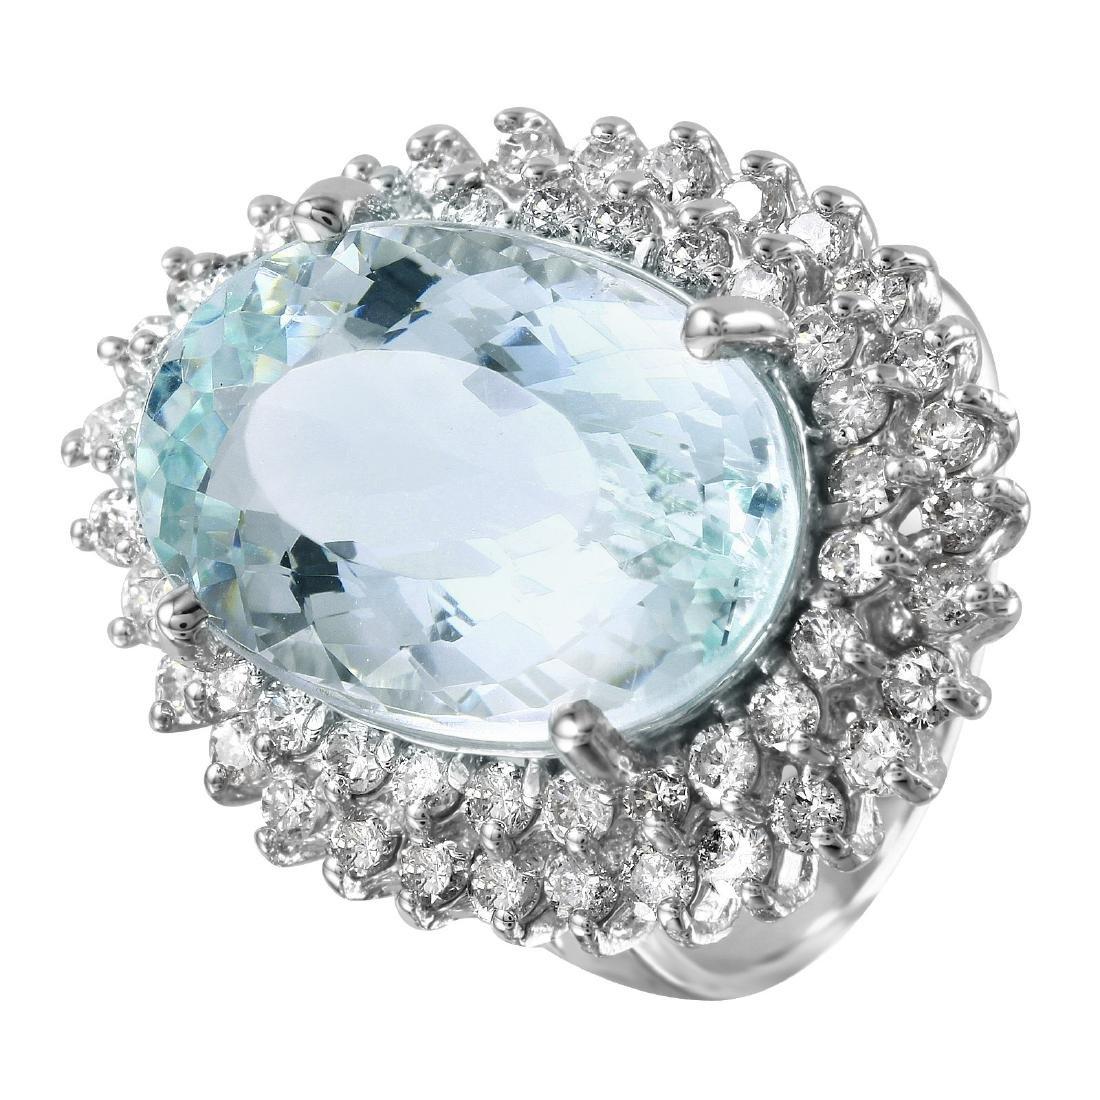 14KT White Gold 11.1ctw Aquamarine Diamond Cocktail